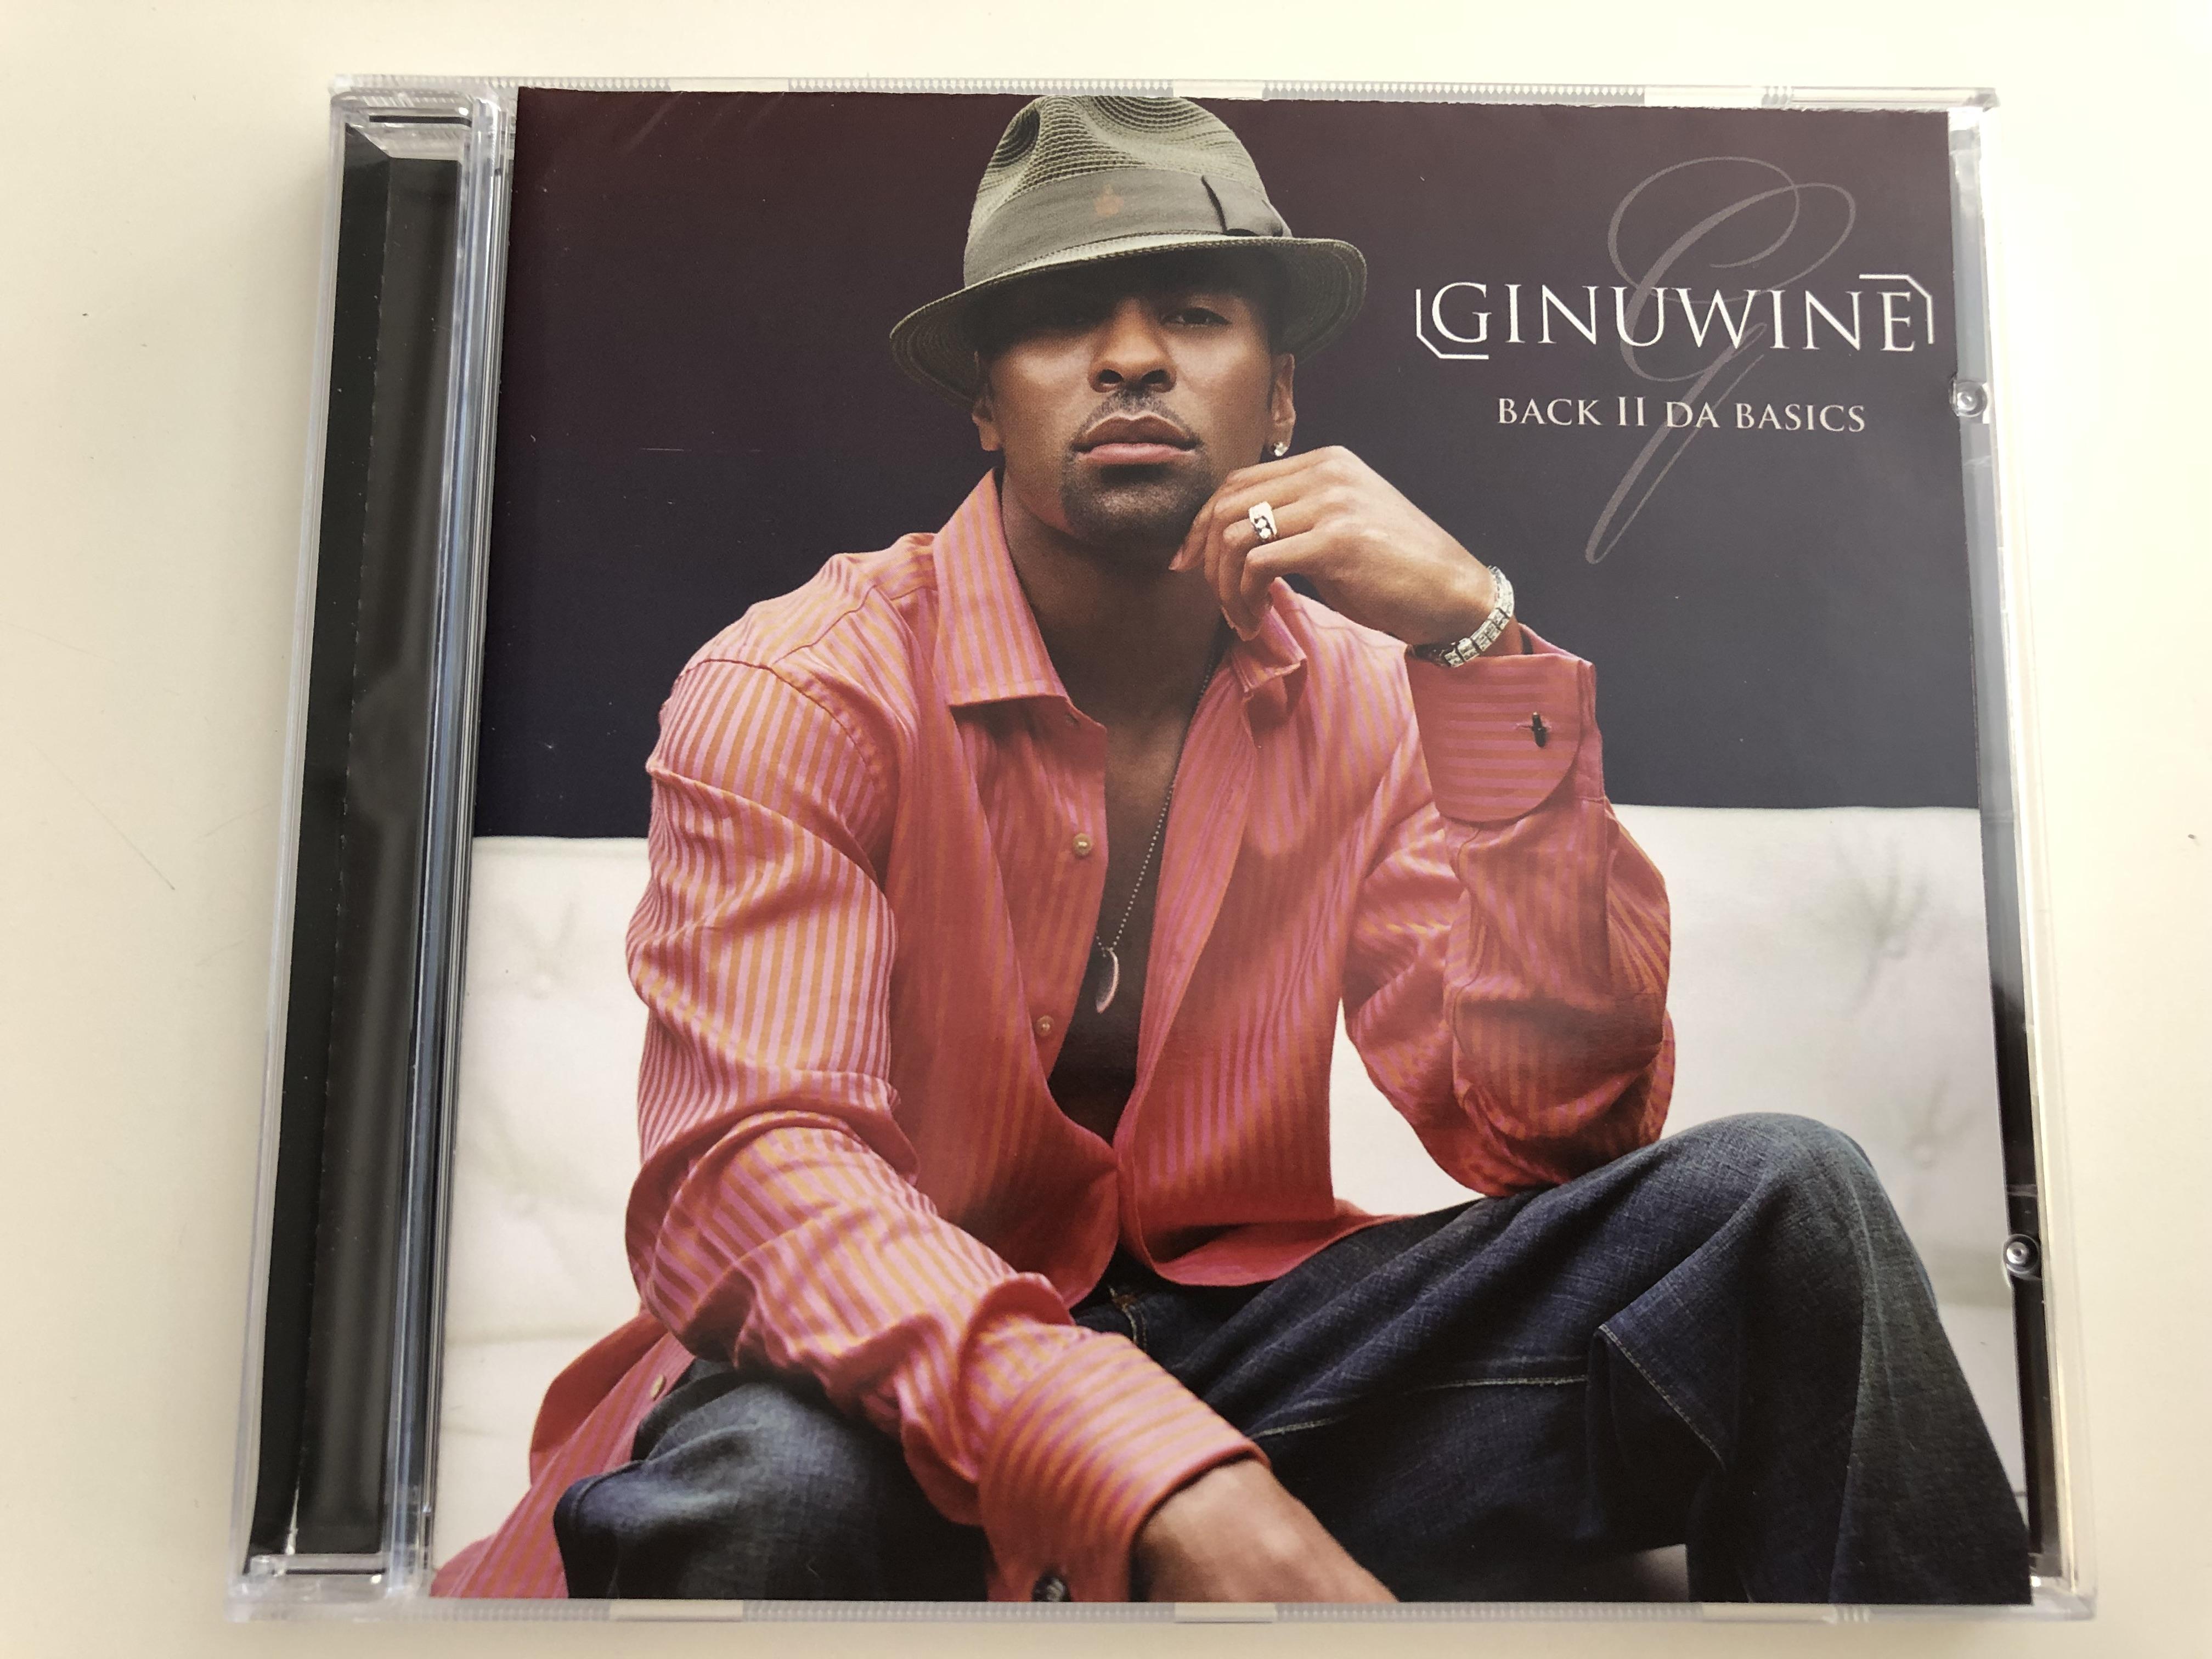 ginuwine-back-ii-da-basics-secrets.-the-club-betta-half-take-a-chance-audio-cd-2005-sony-bmg-1-.jpg